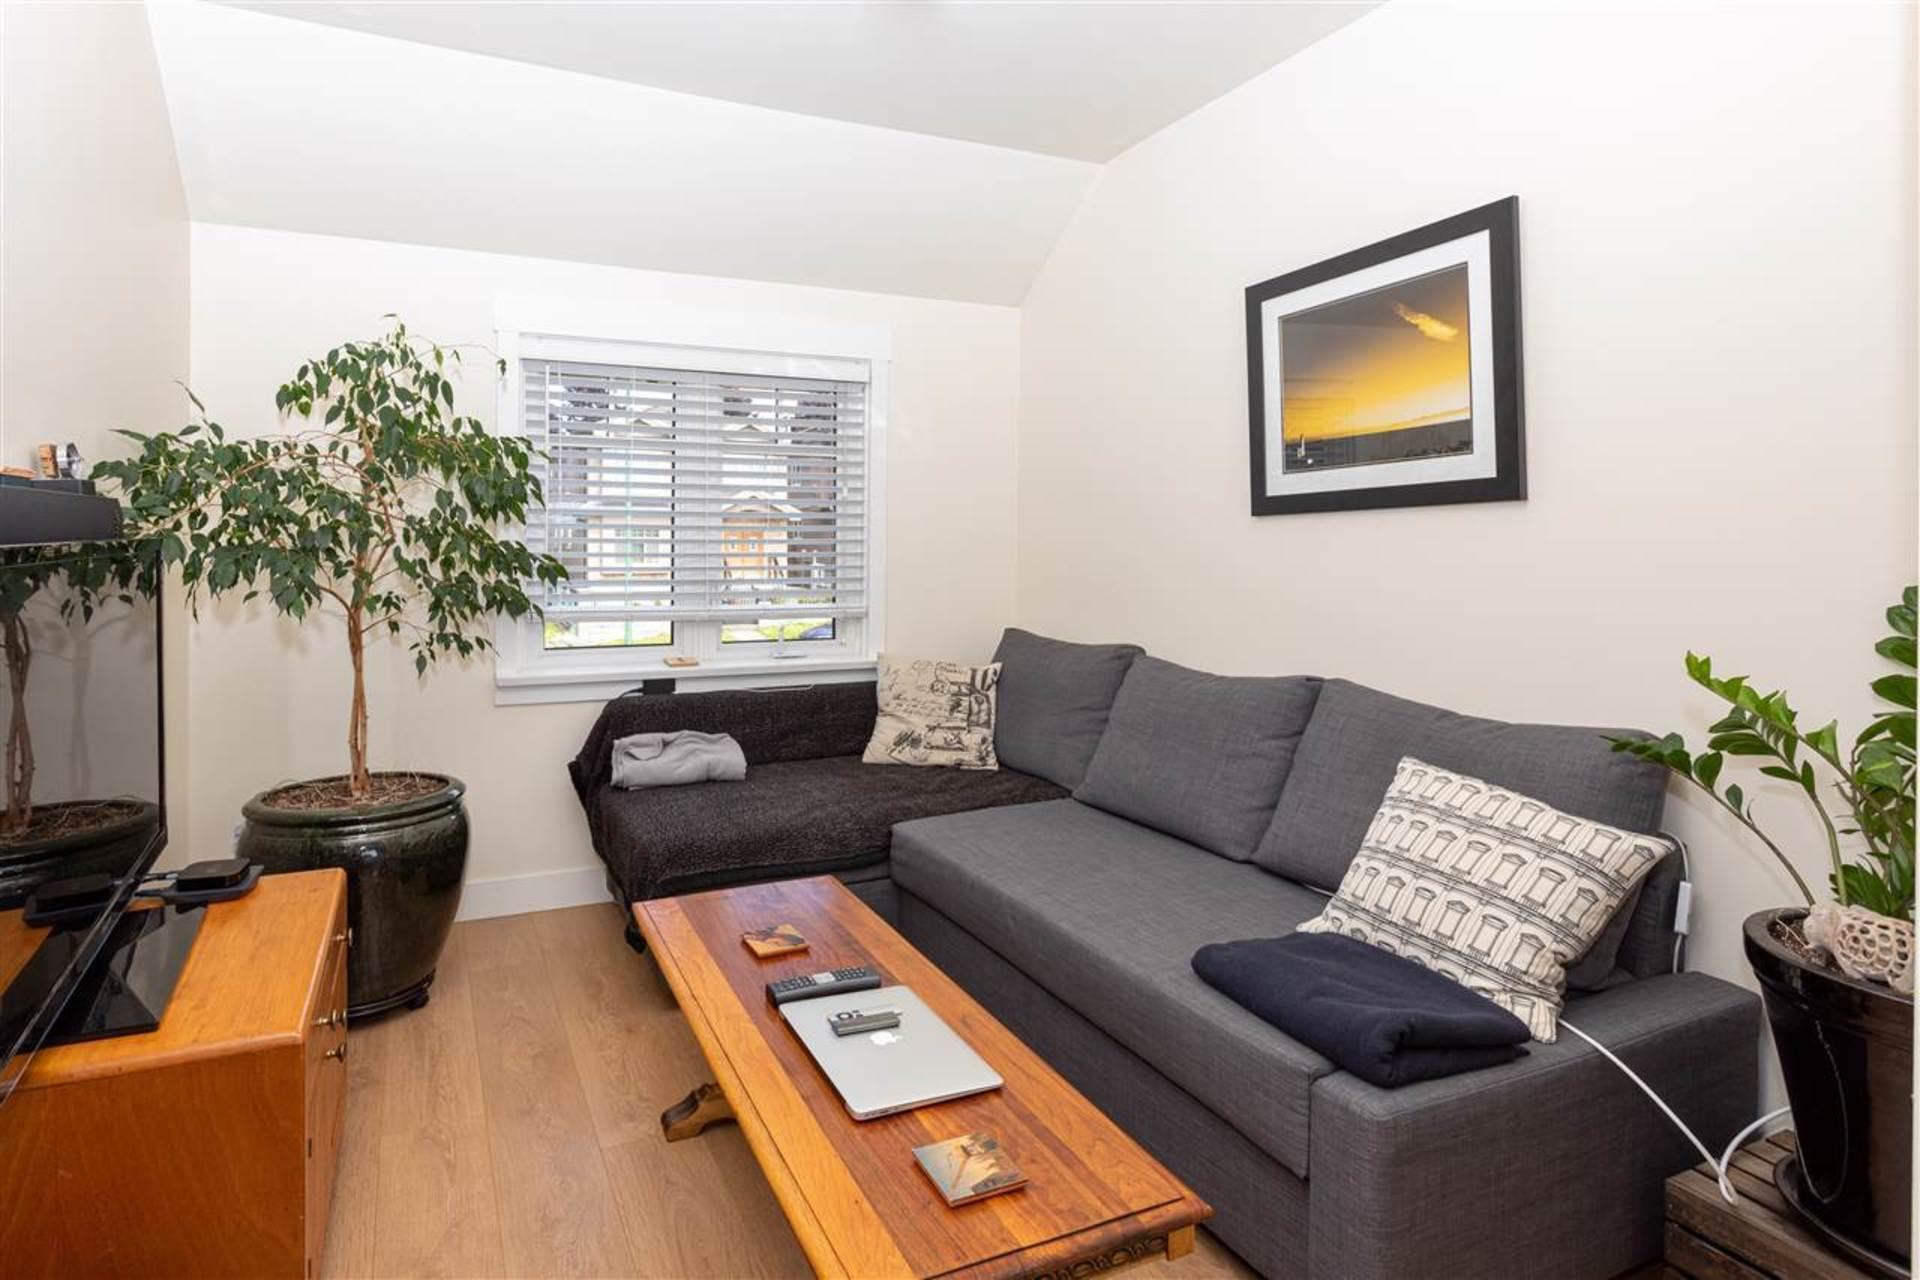 3912-parker-street-willingdon-heights-burnaby-north-20 at 3912 Parker Street, Willingdon Heights, Burnaby North